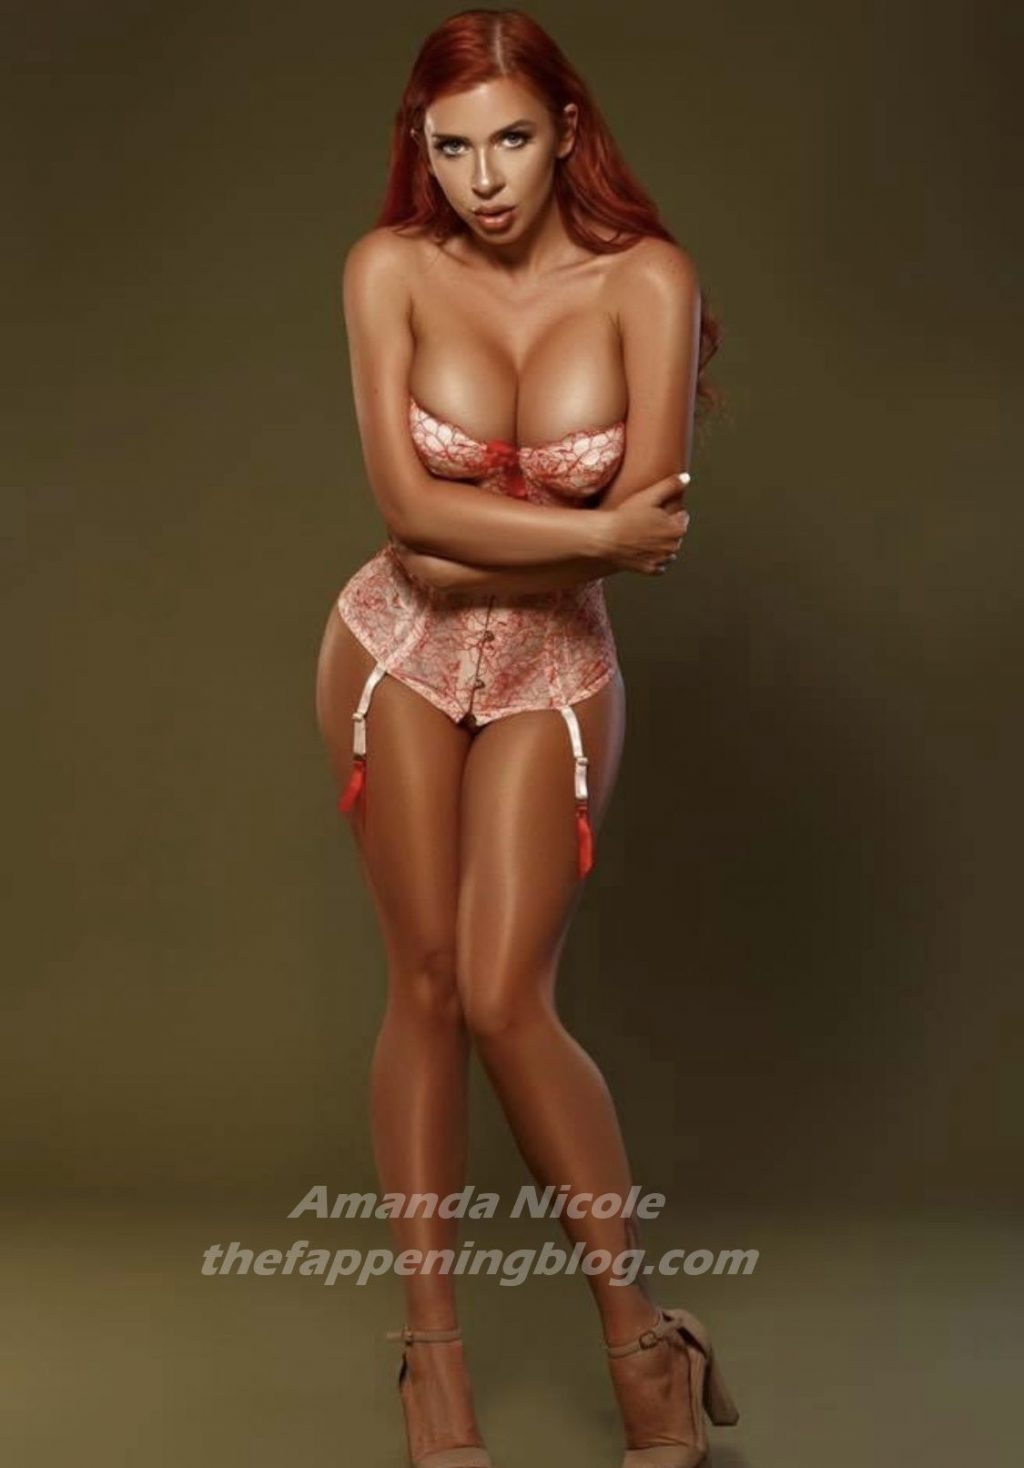 Amanda Nicole's Great Transformation (42 Photos)